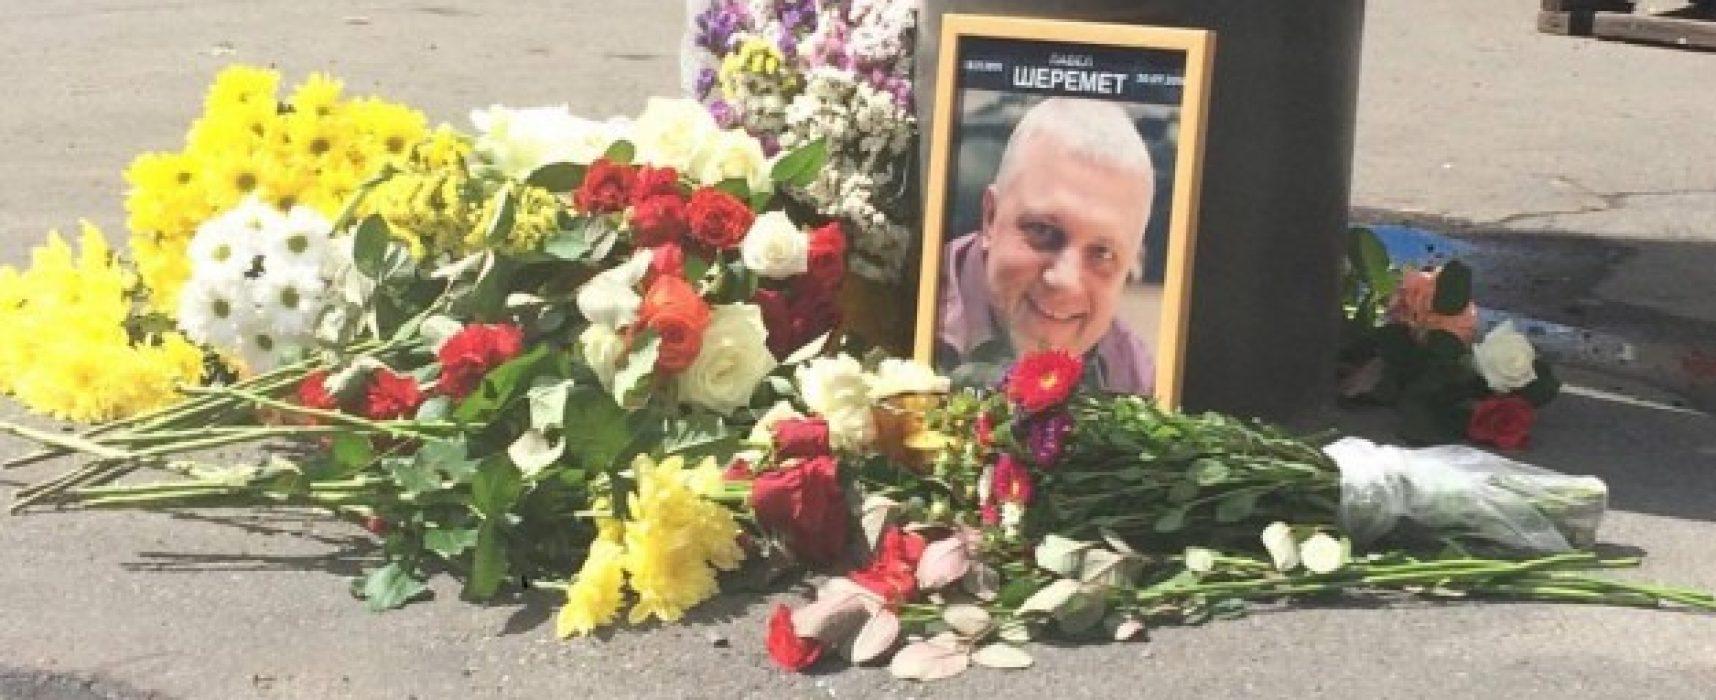 El asesinato de Pavel Sheremet